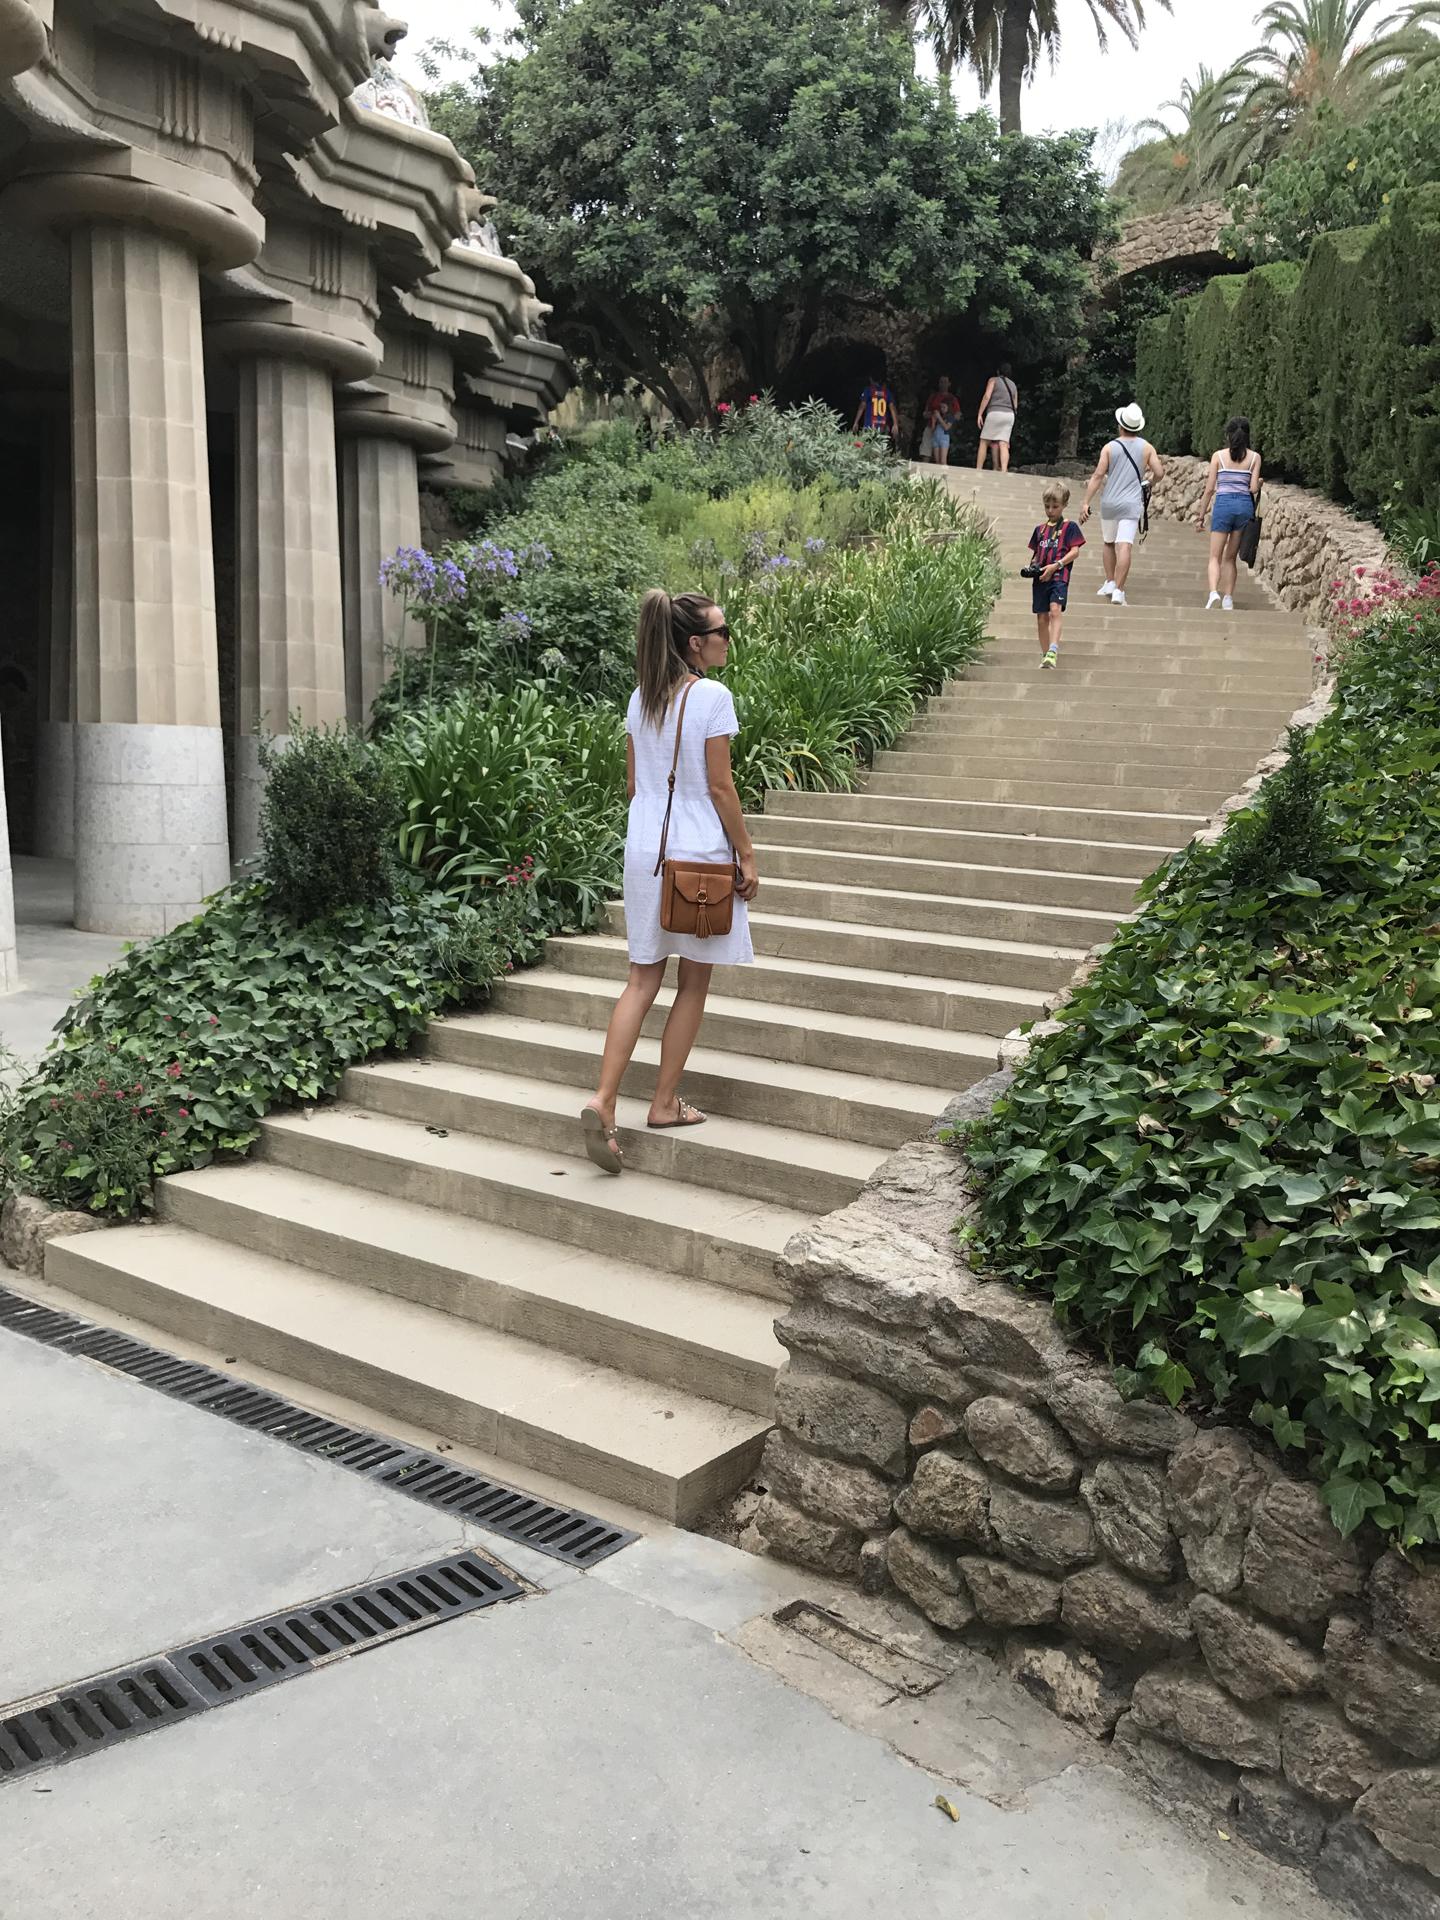 Merrick's Art Park Guell Staircase